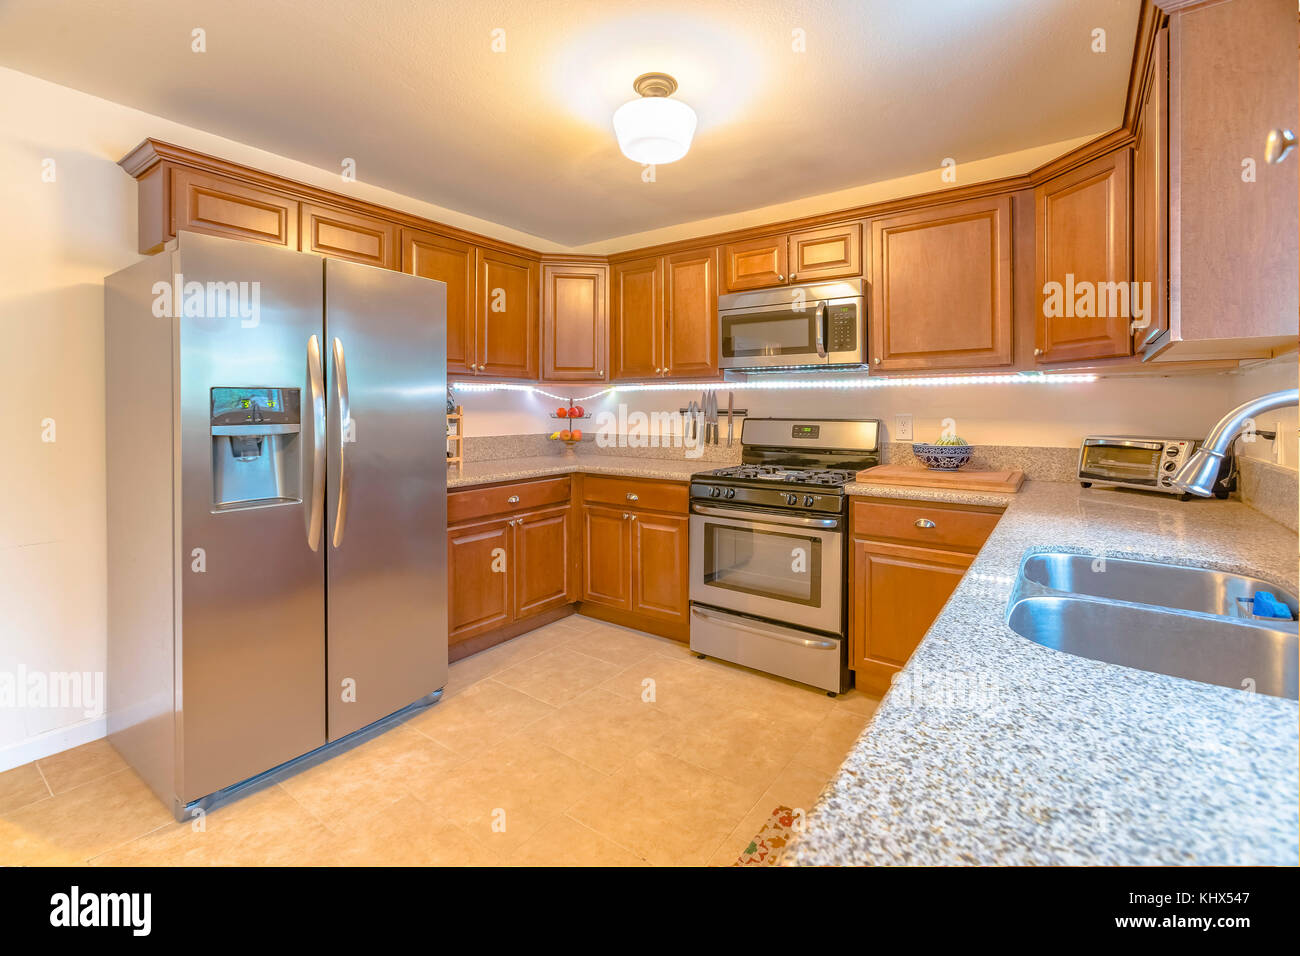 Granite Counter Tops Stockfotos & Granite Counter Tops Bilder - Alamy